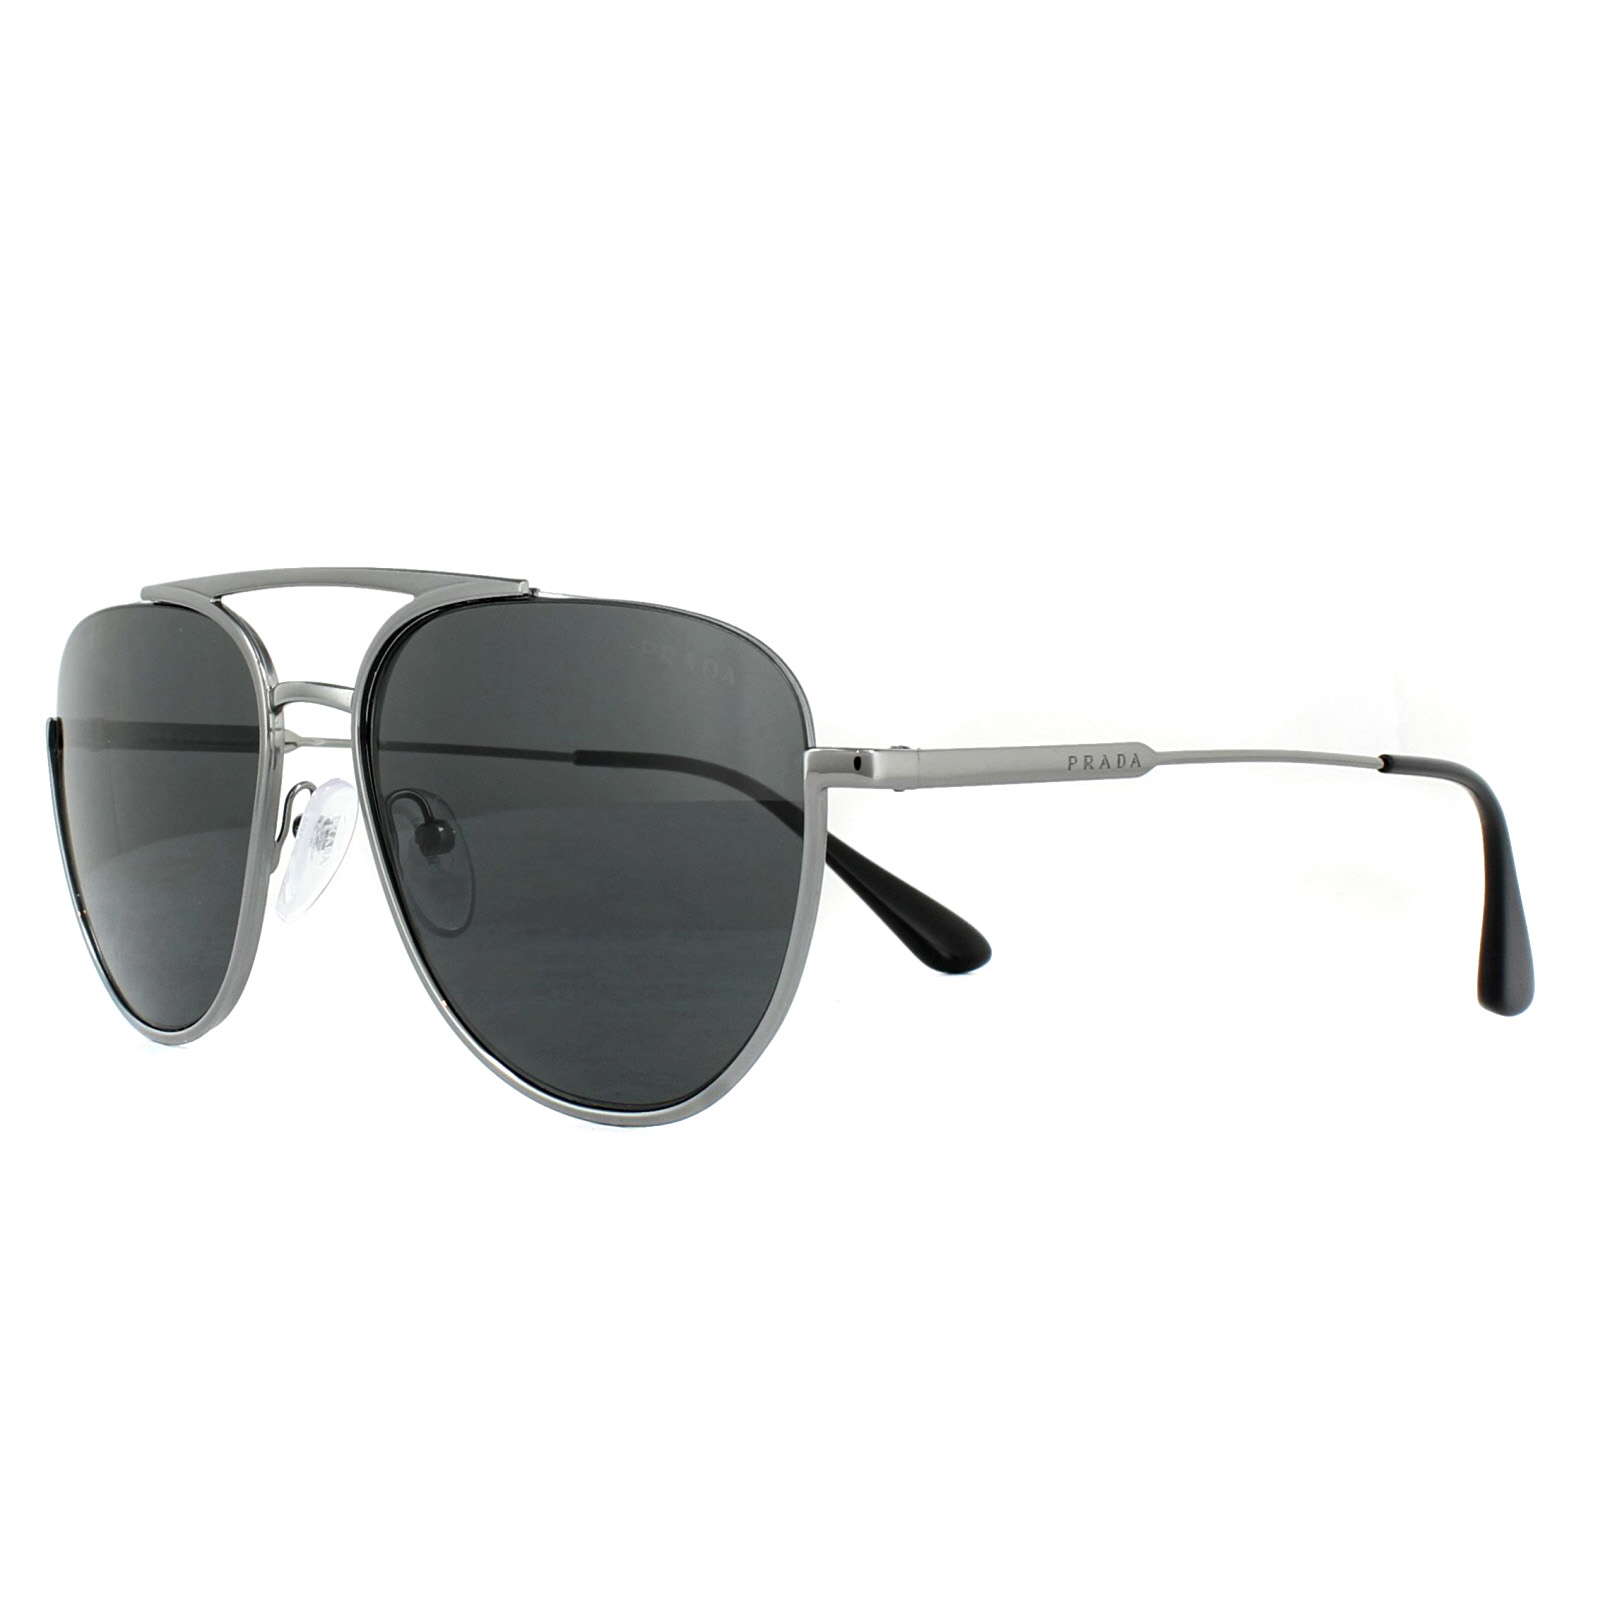 6a18c213d2c Prada Sunglasses PR50US 5AV5S0 Gunmetal Grey 8053672831726